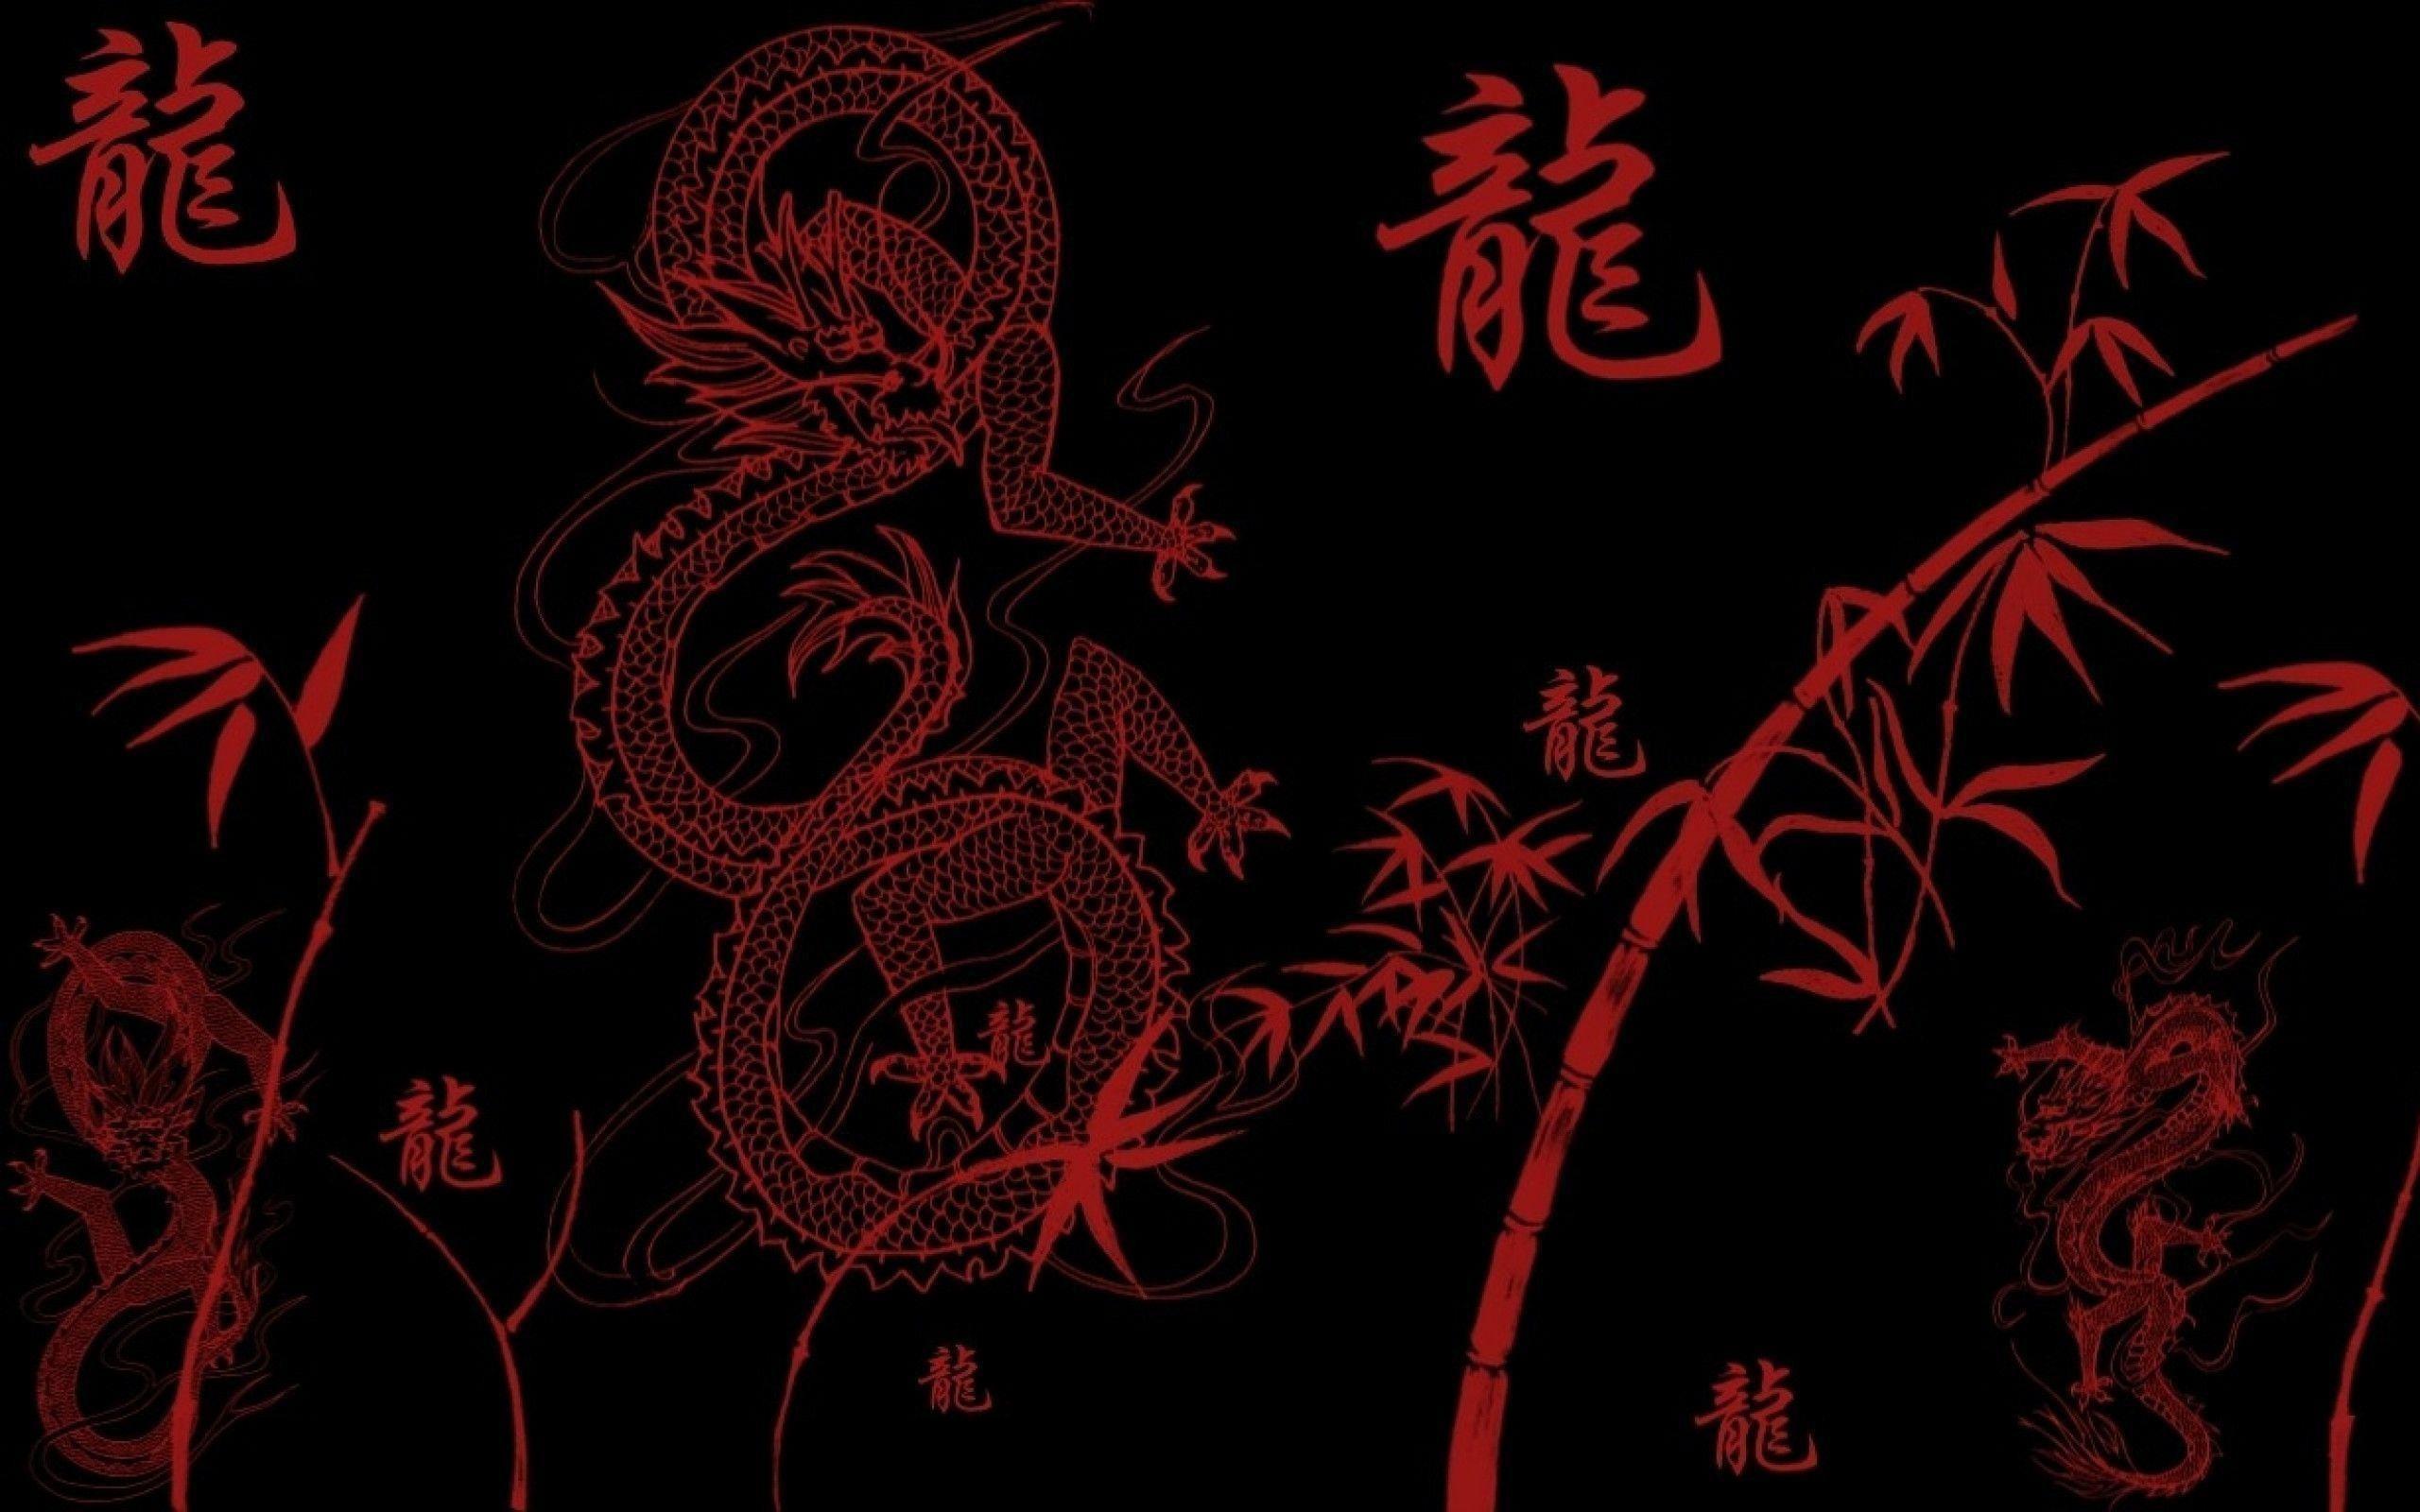 Japan Dragon Wallpaper In 2020 Japanese Dragon Japanese Background Art Wallpaper